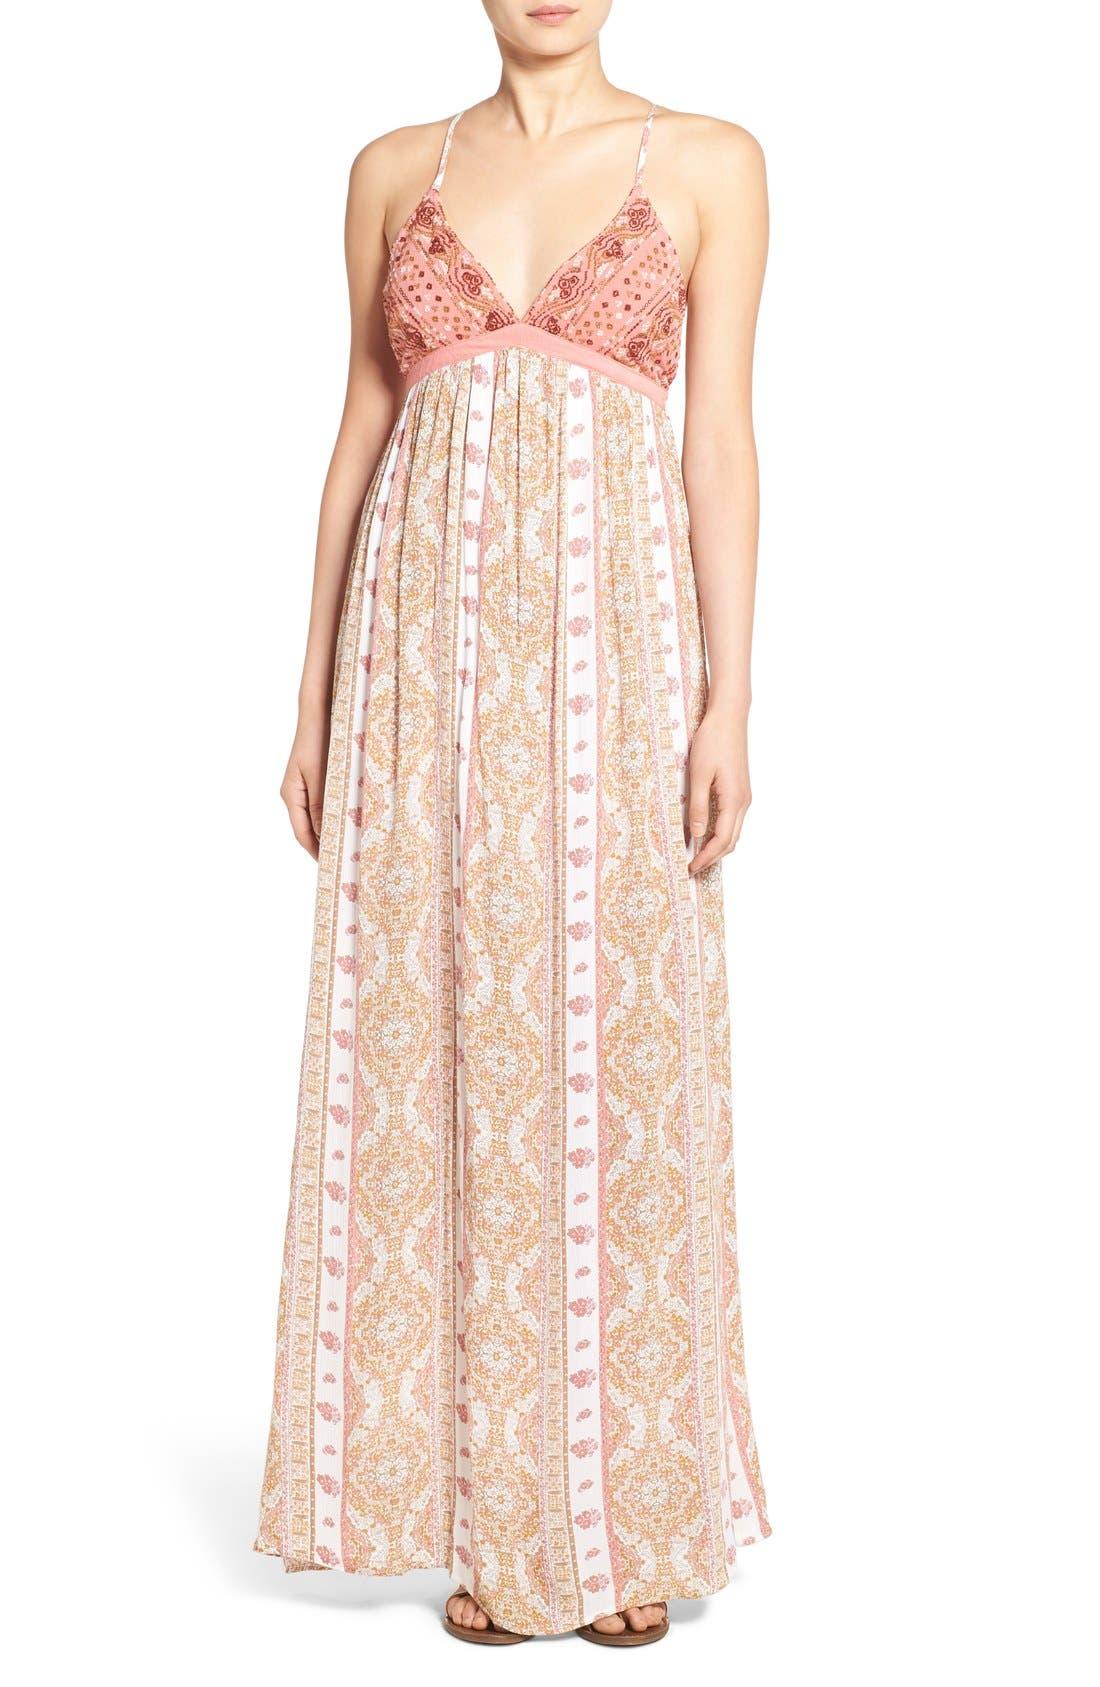 Alternate Image 1 Selected - O'Neill 'Della' Embroidered Woven Maxi Dress